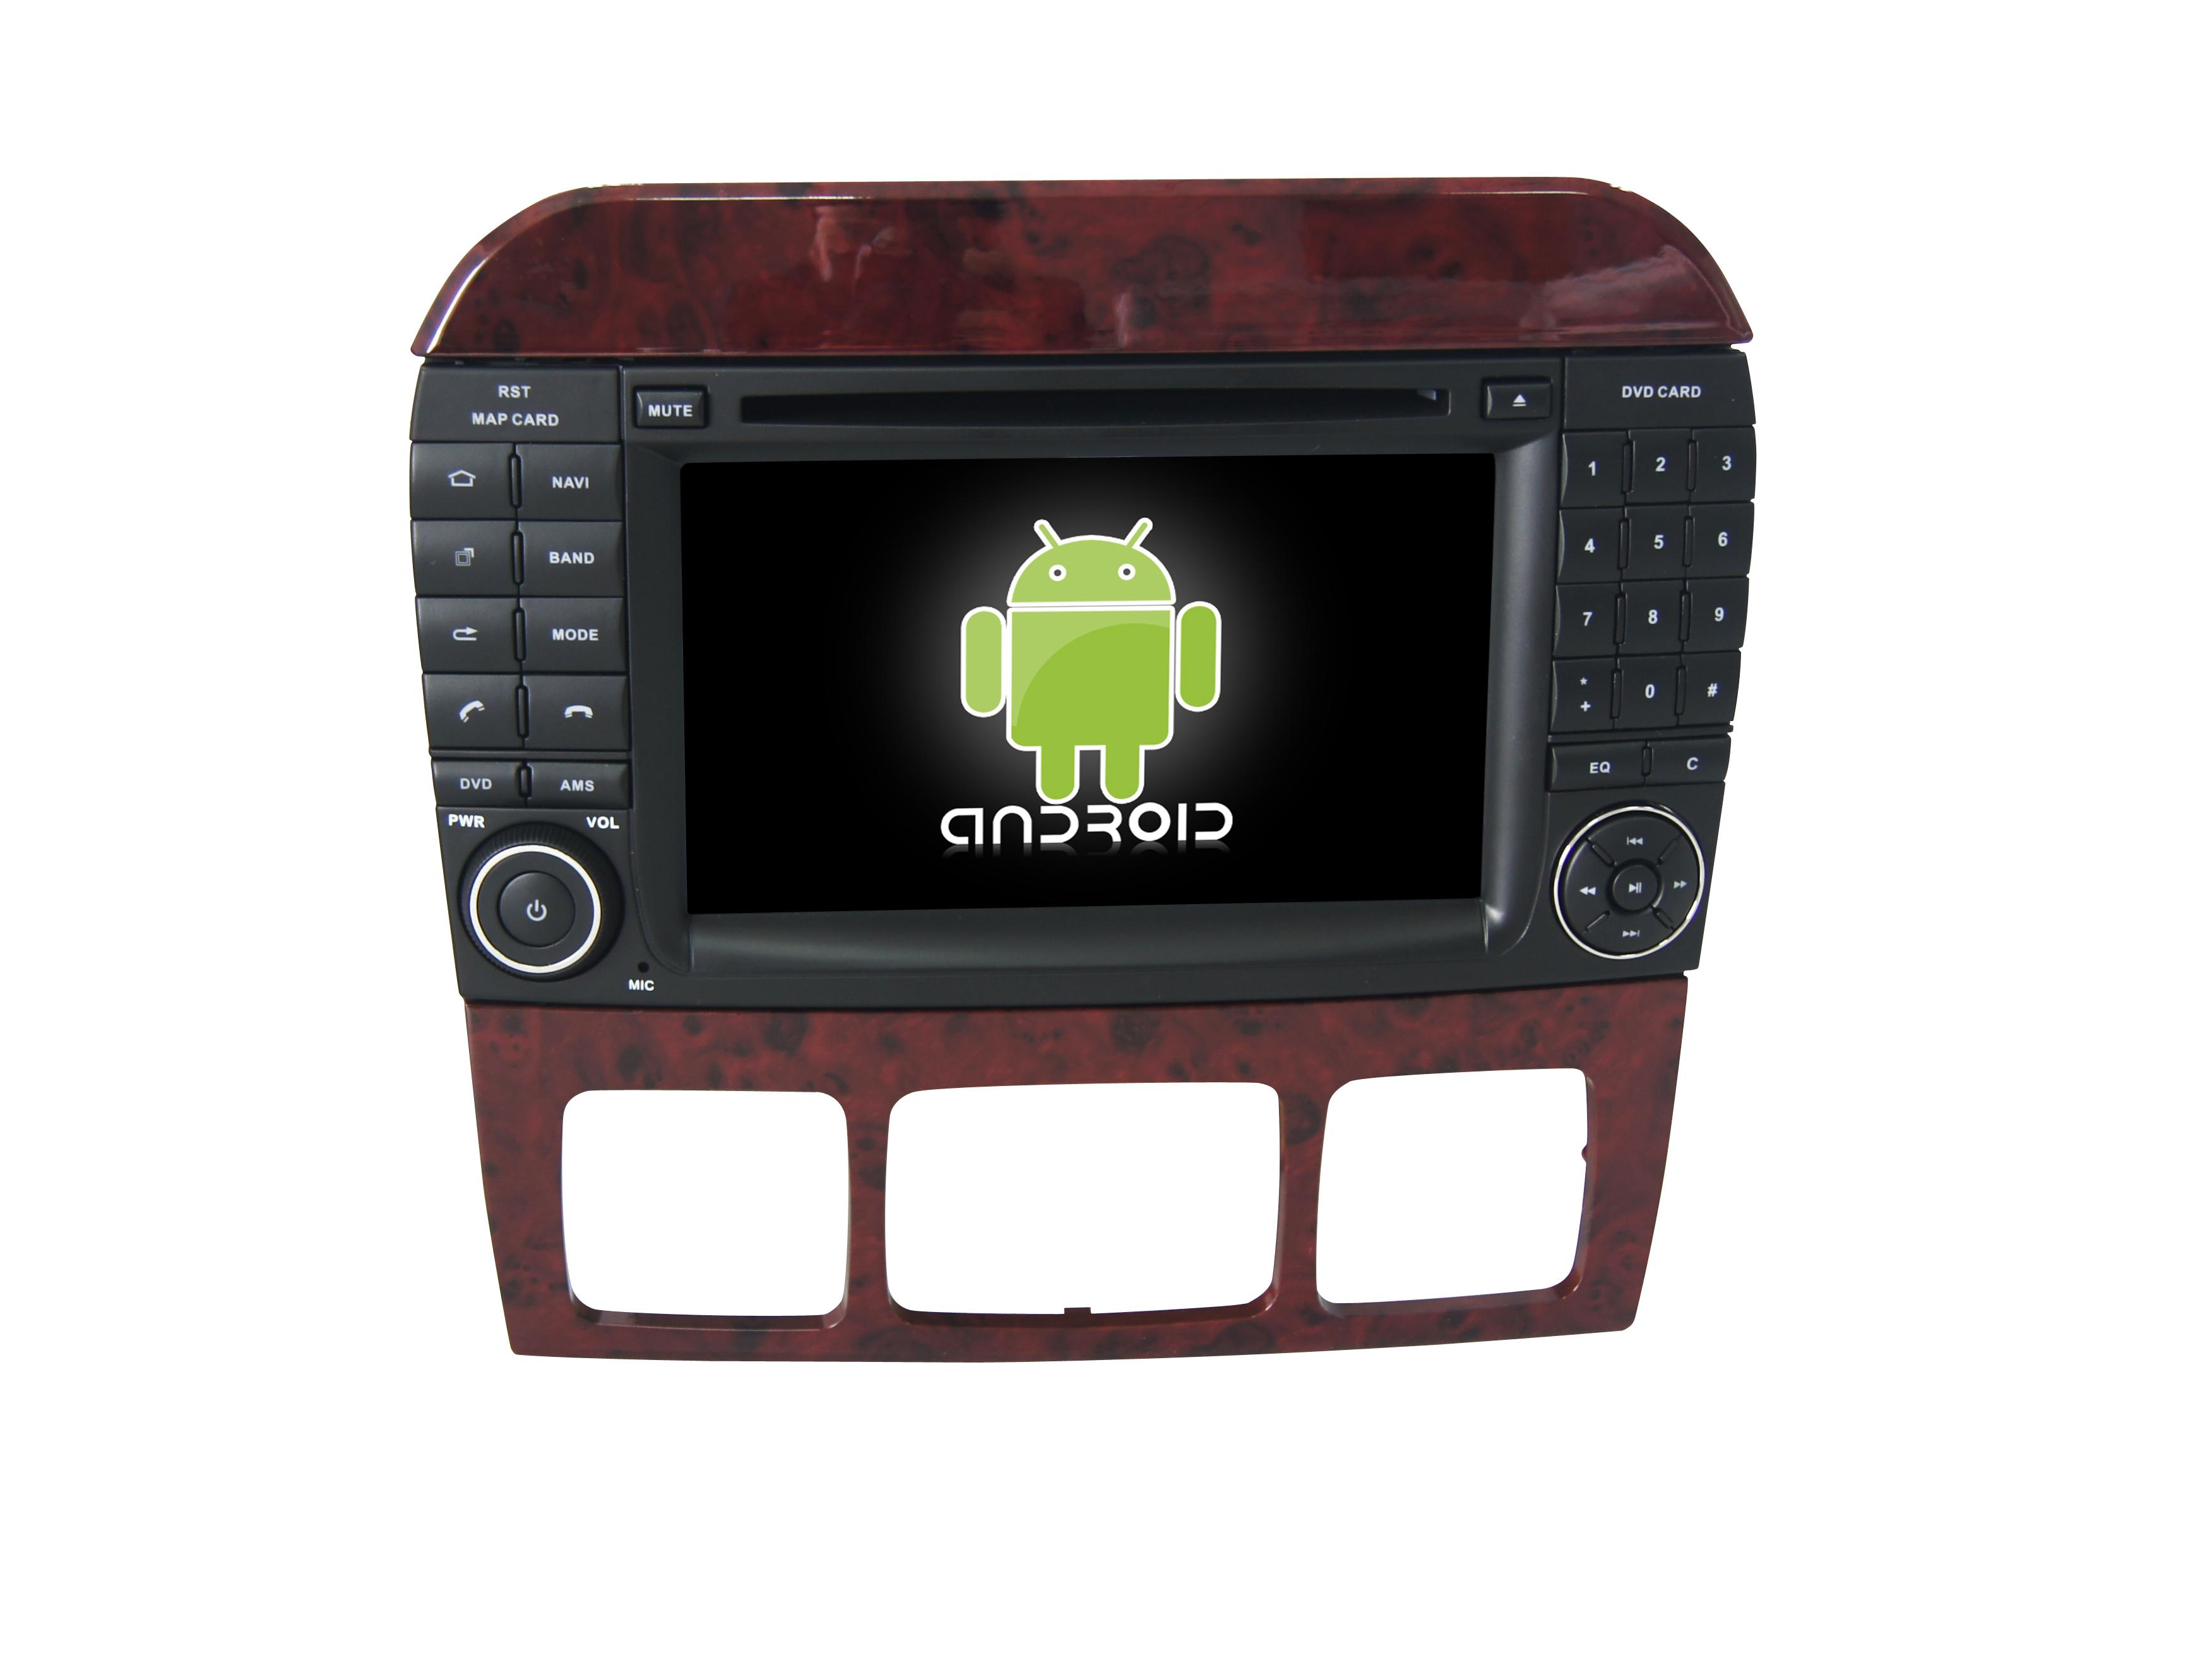 Штатная магнитола CARMEDIA KR-7105-T8 для Mercedes S-класс 1998-2005 (W220) Android 7.1.2 vivibright gp90 lcd projector 3200 lumens android 4 44 os